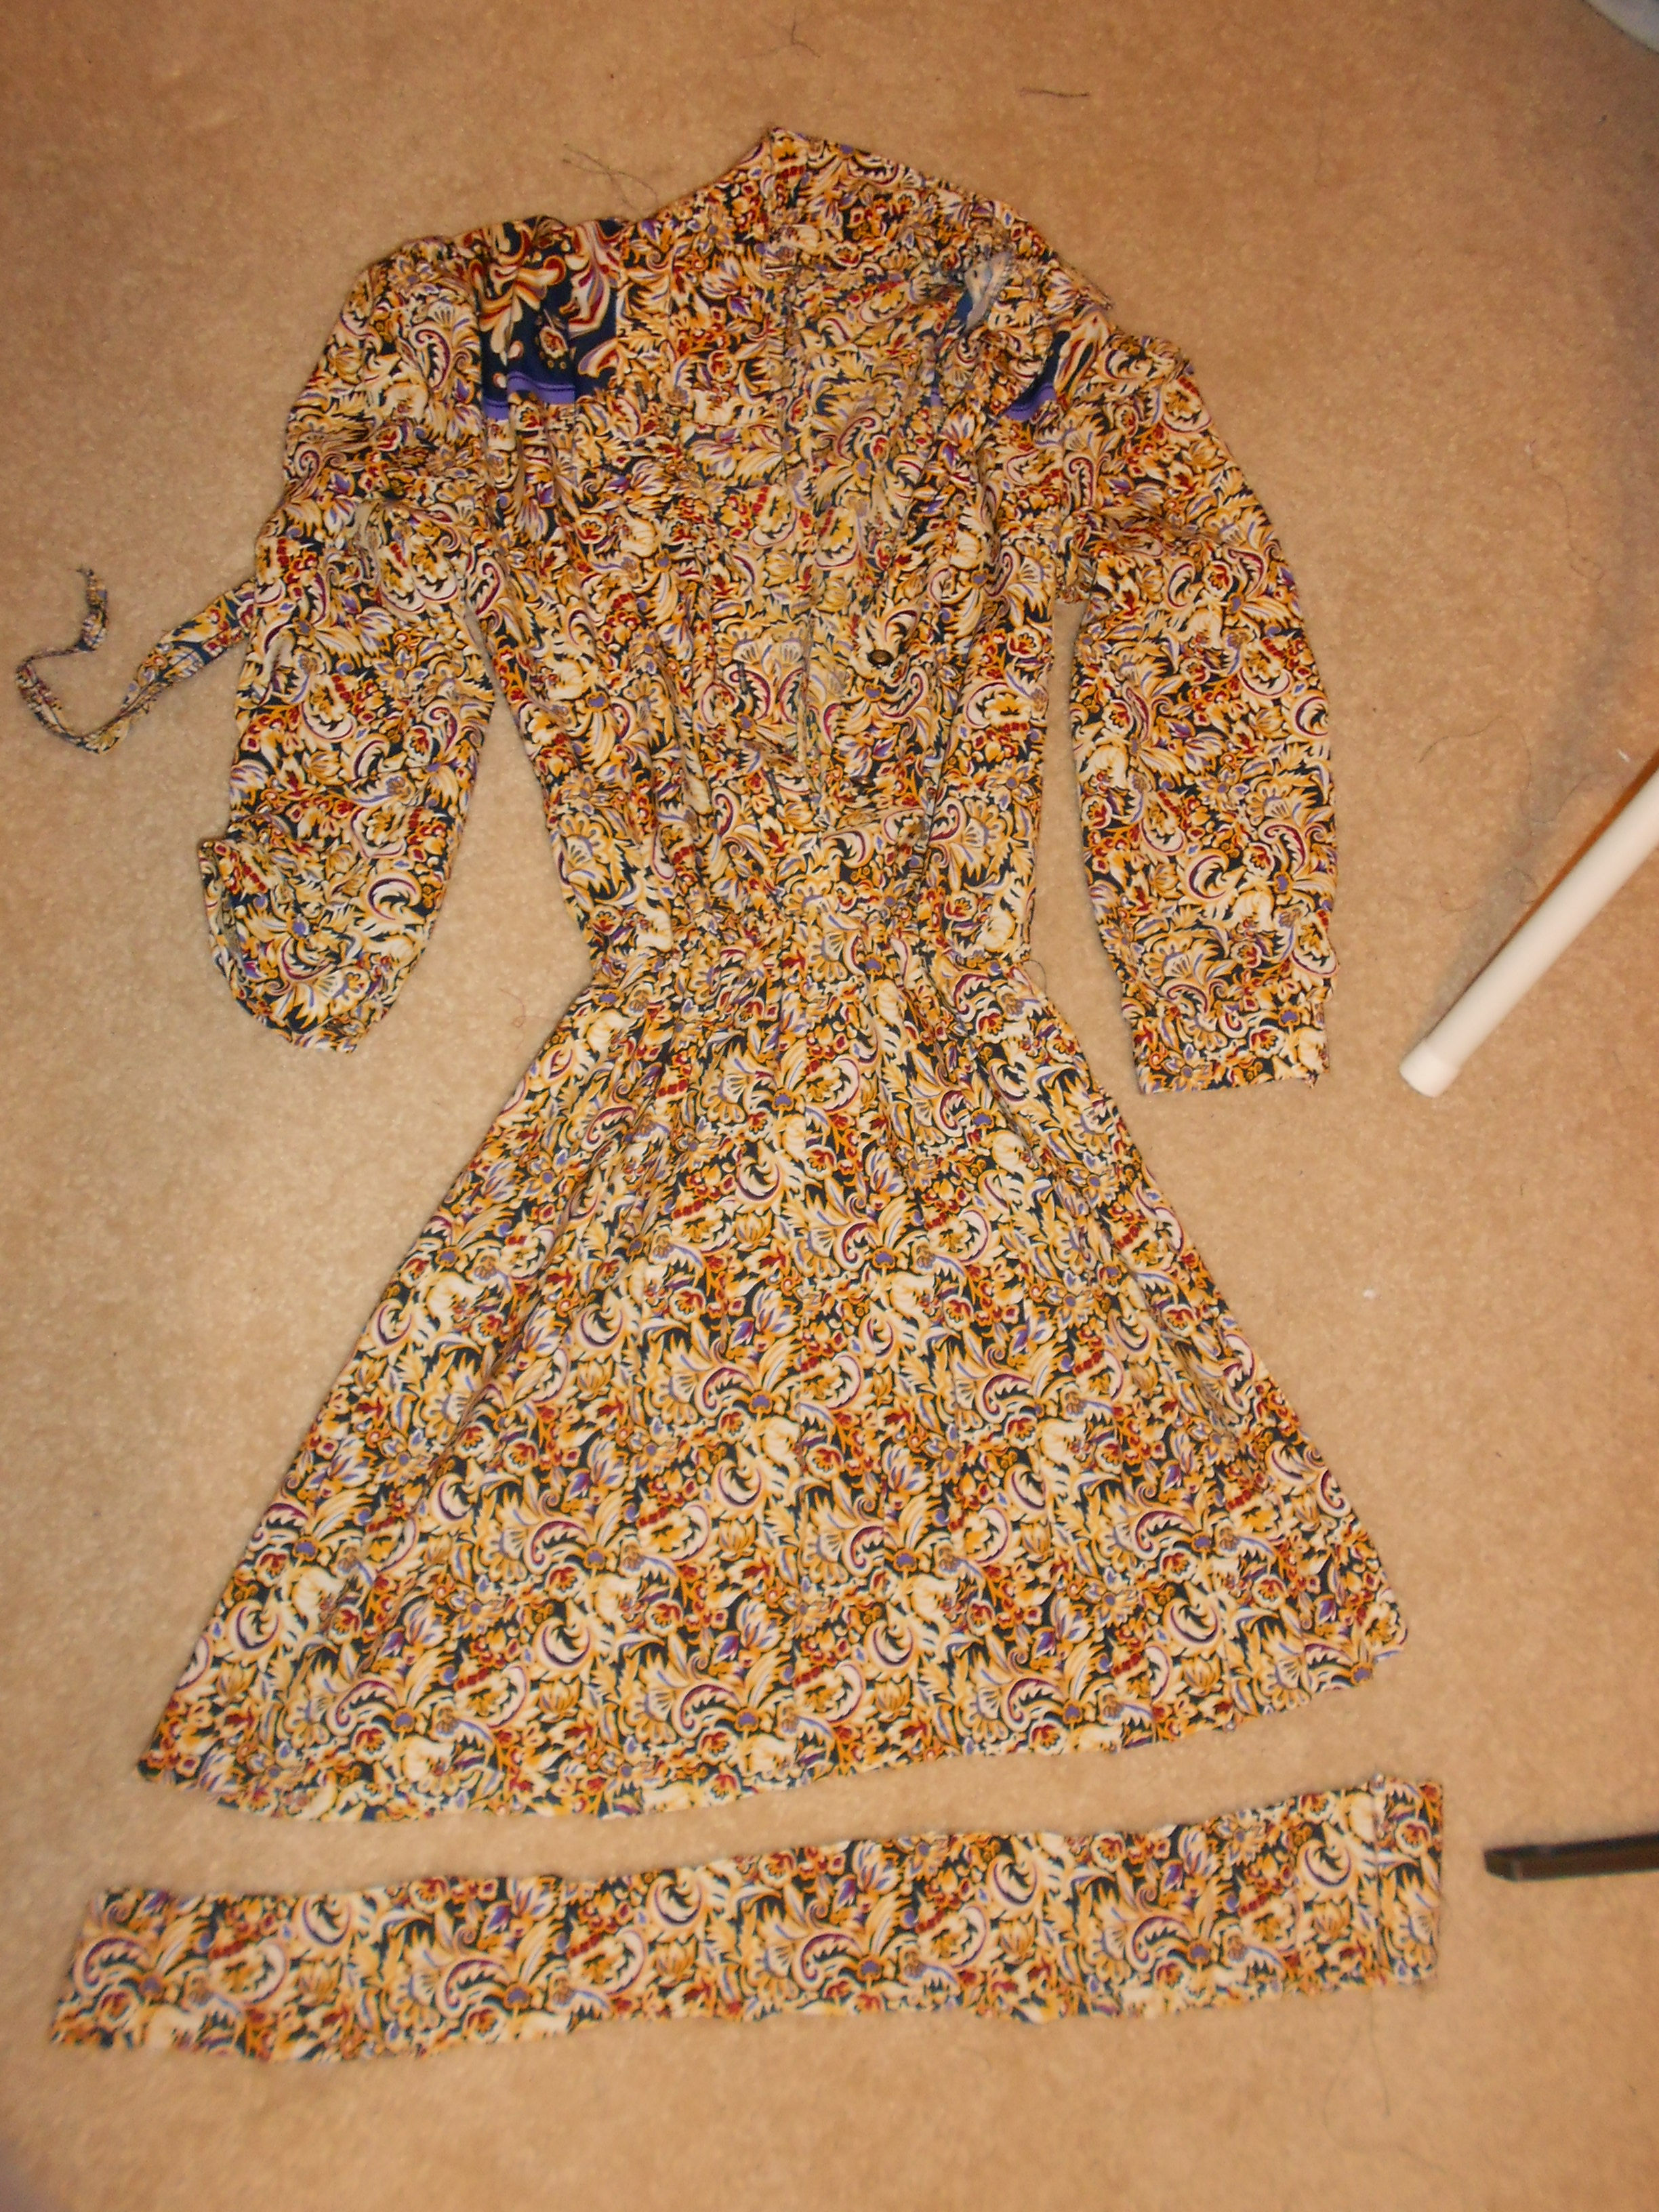 Day 292: Marigold Dress 6